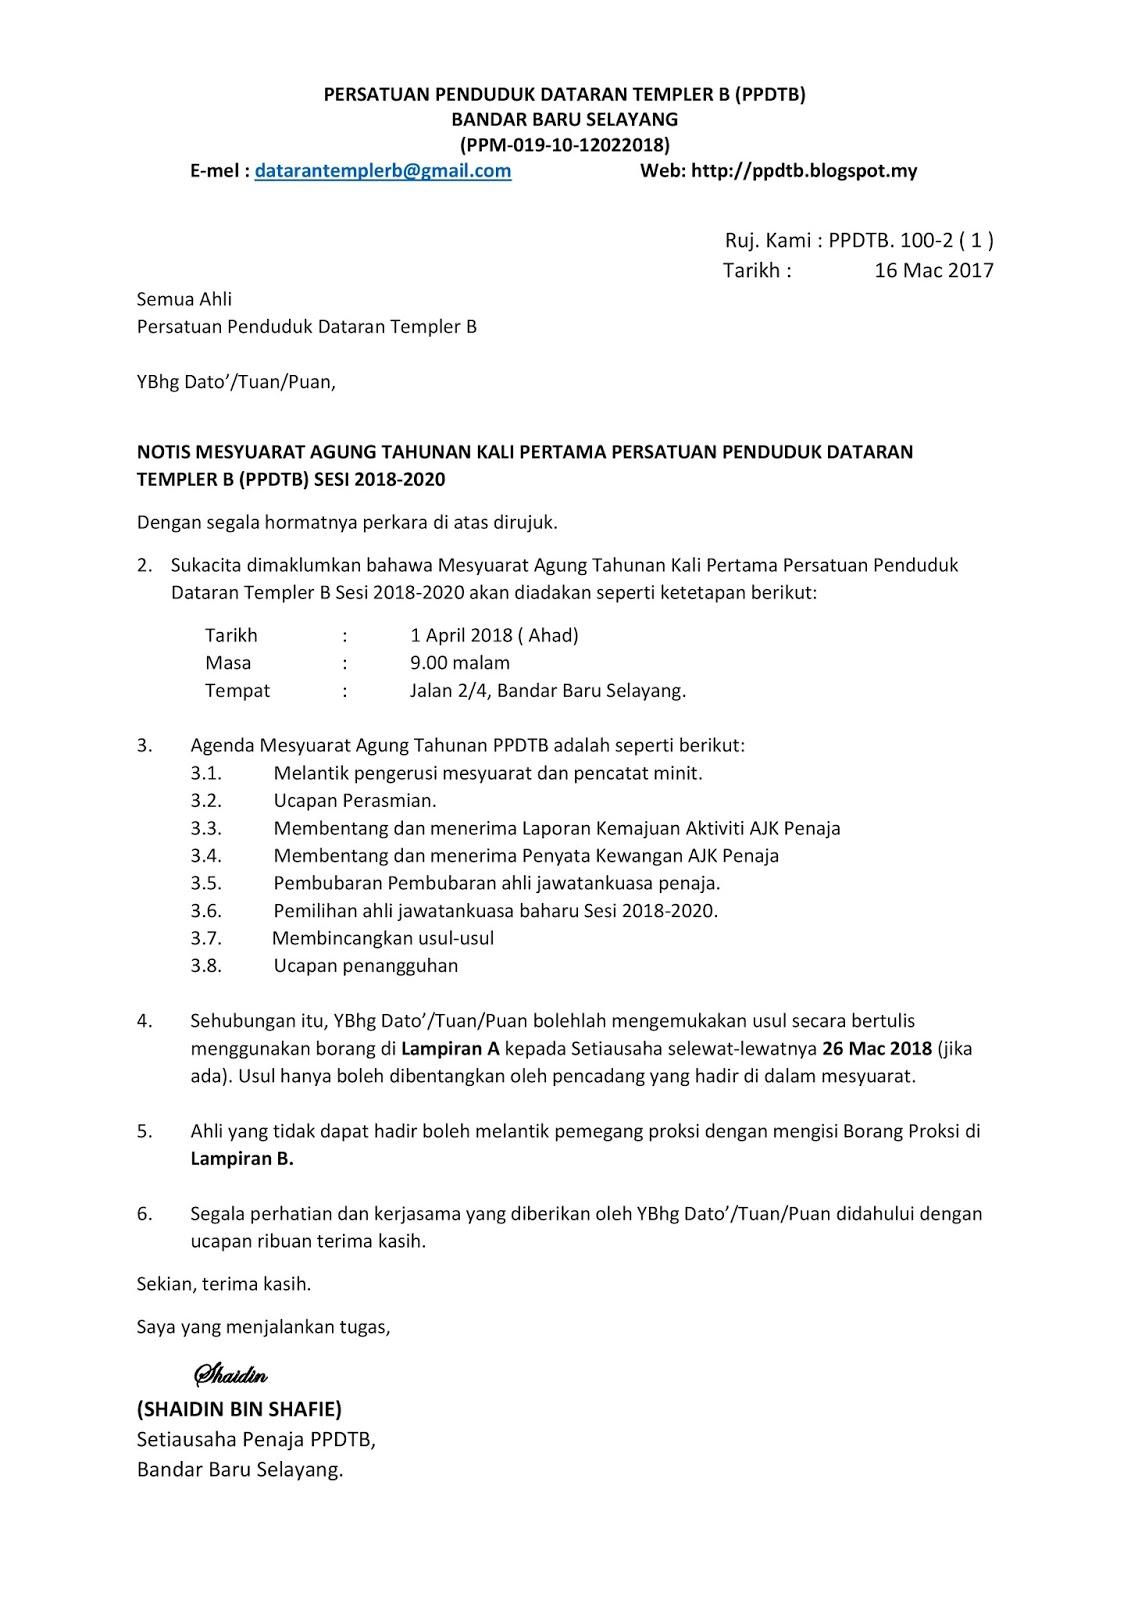 Notis Mesyuarat Agung Tahunan Kali Pertama Persatuan Penduduk Dataran Templer B Ppdtb Sesi 2018 2020